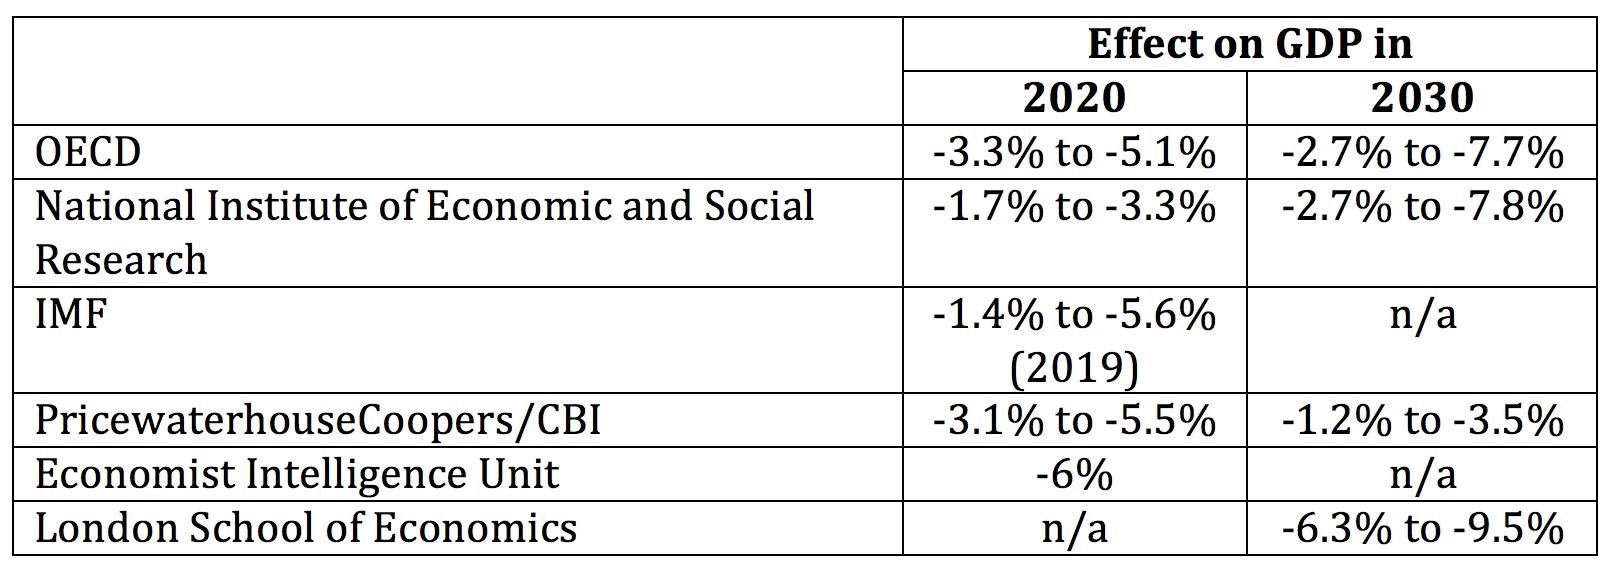 Sources:  OECD ,  NIESR ,  IMF ,  PWC/CBI ,  Economist Intelligence Unit  and  LSE